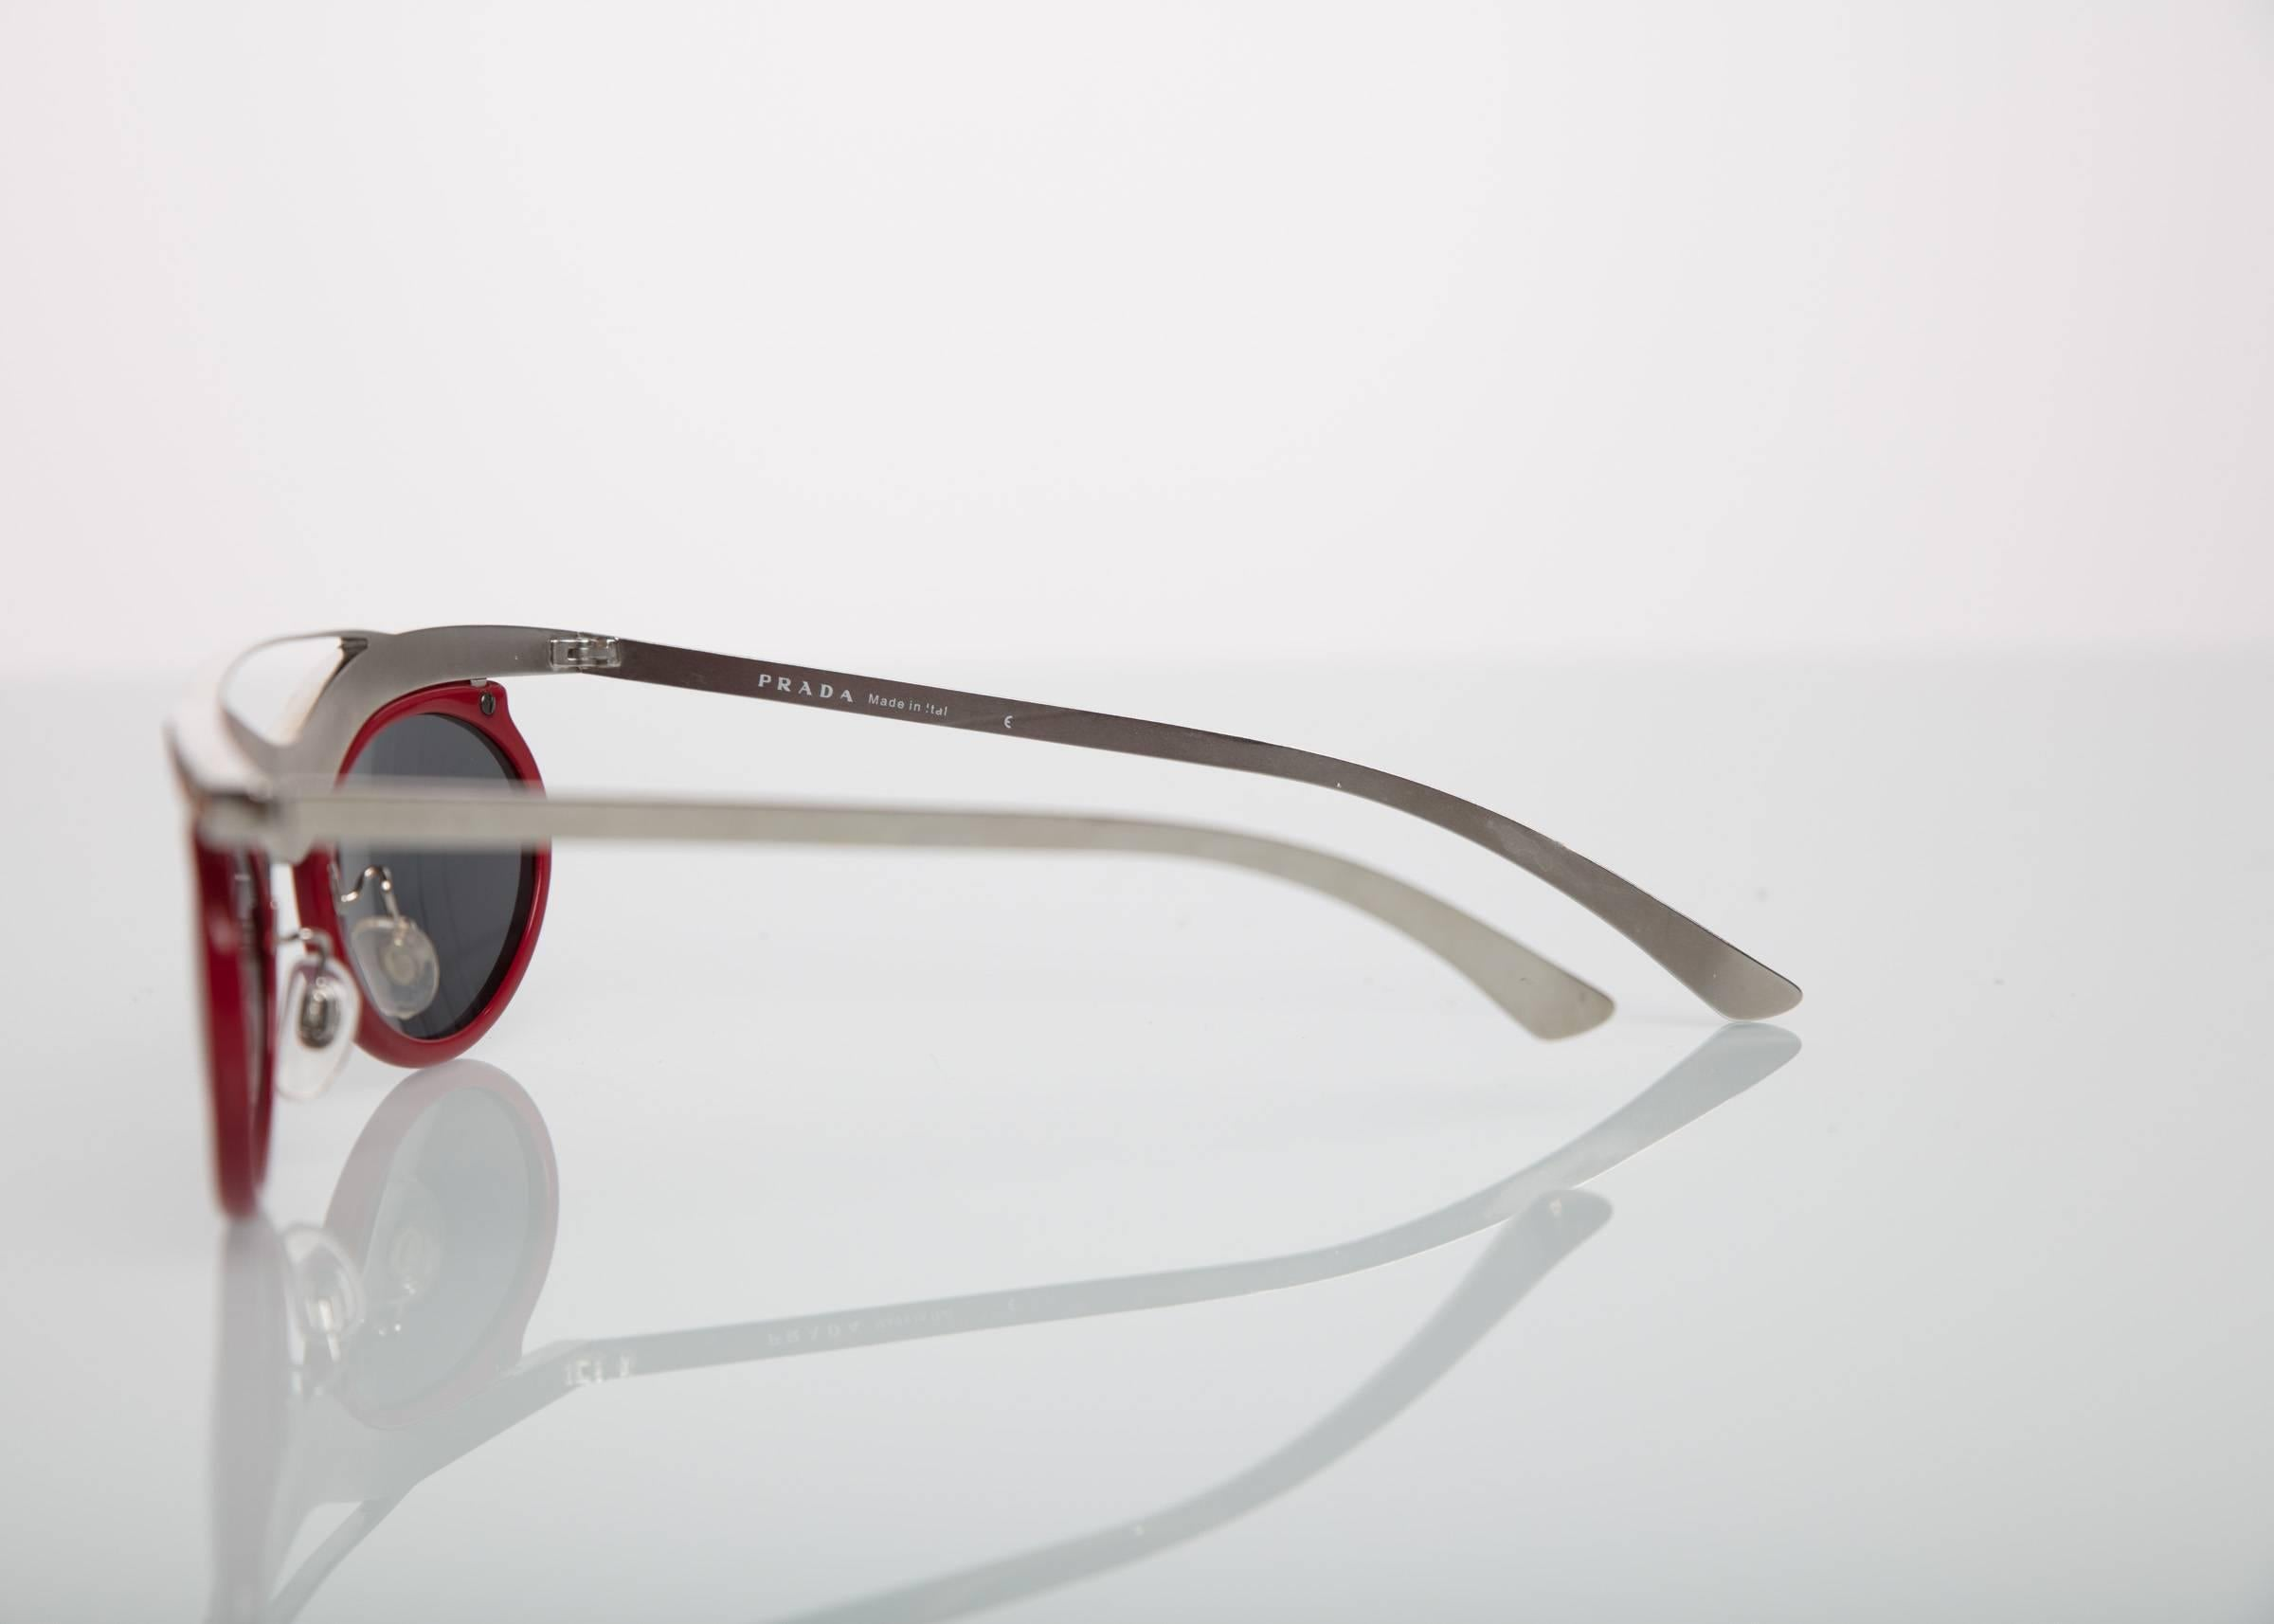 405a1bb6c50e where to buy 2012 prada runway red cat eye amber crystal sunglasses for sale  2 bdb25